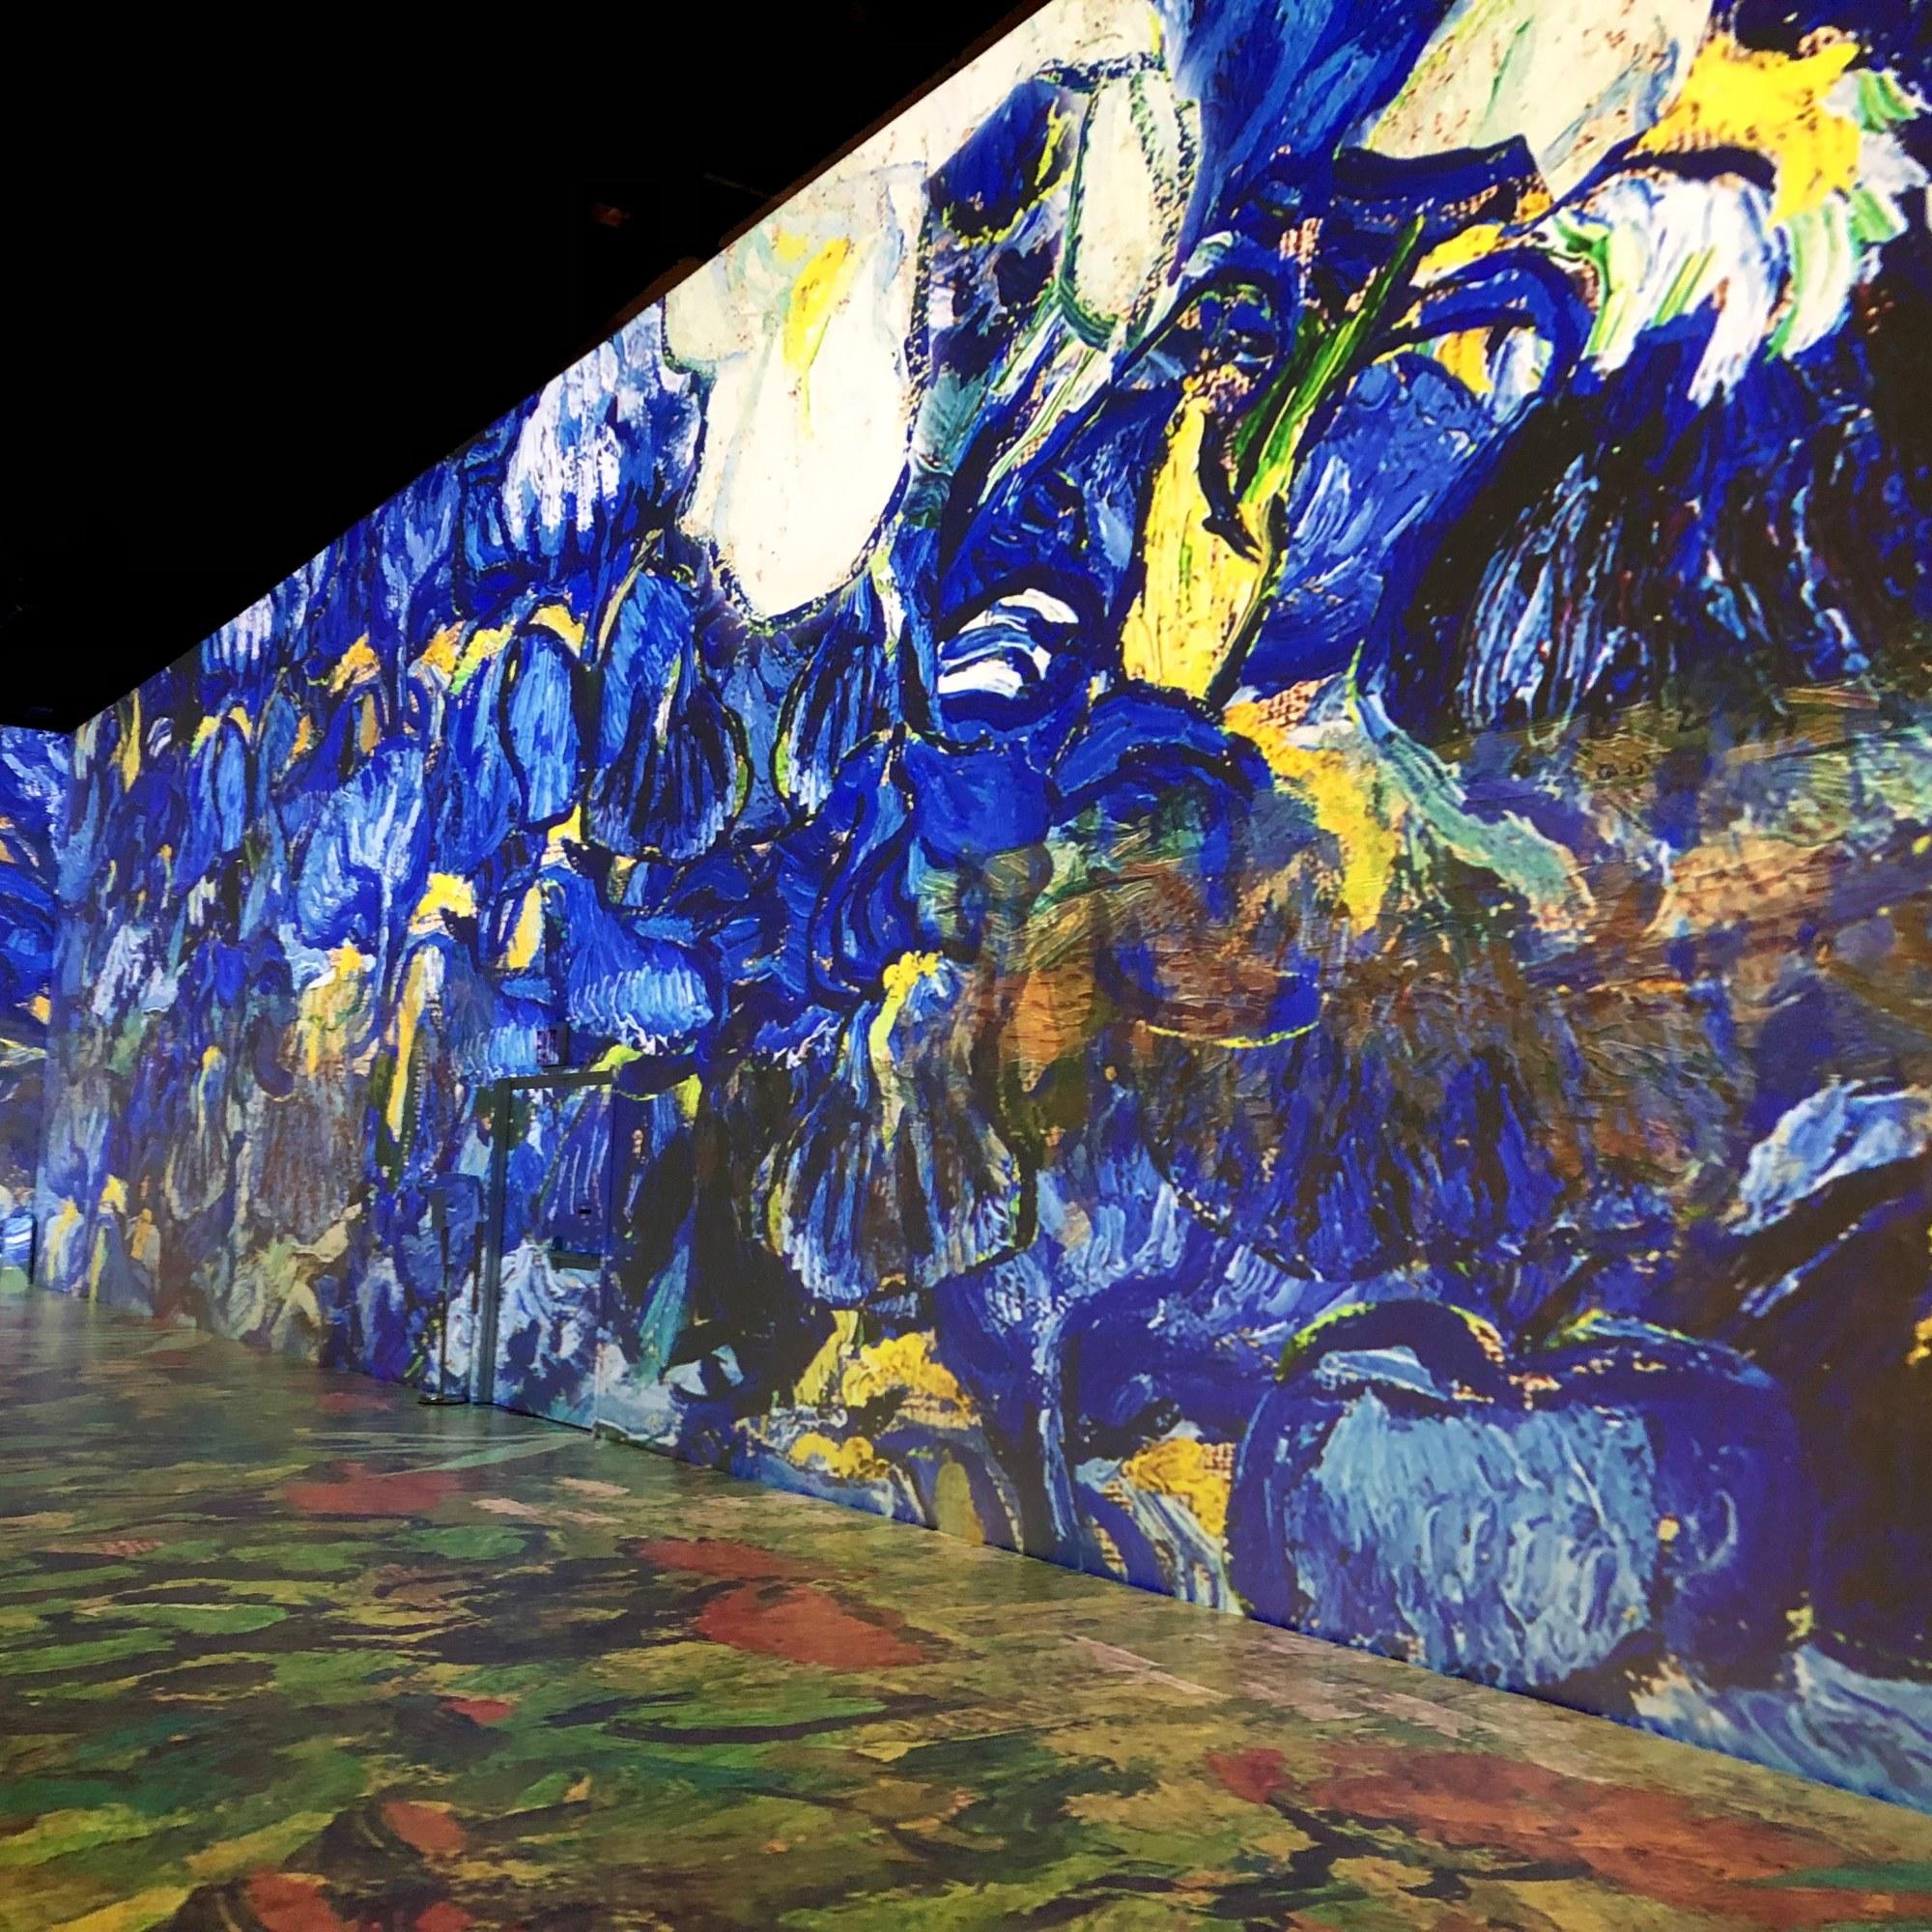 Van Gogh, Irises